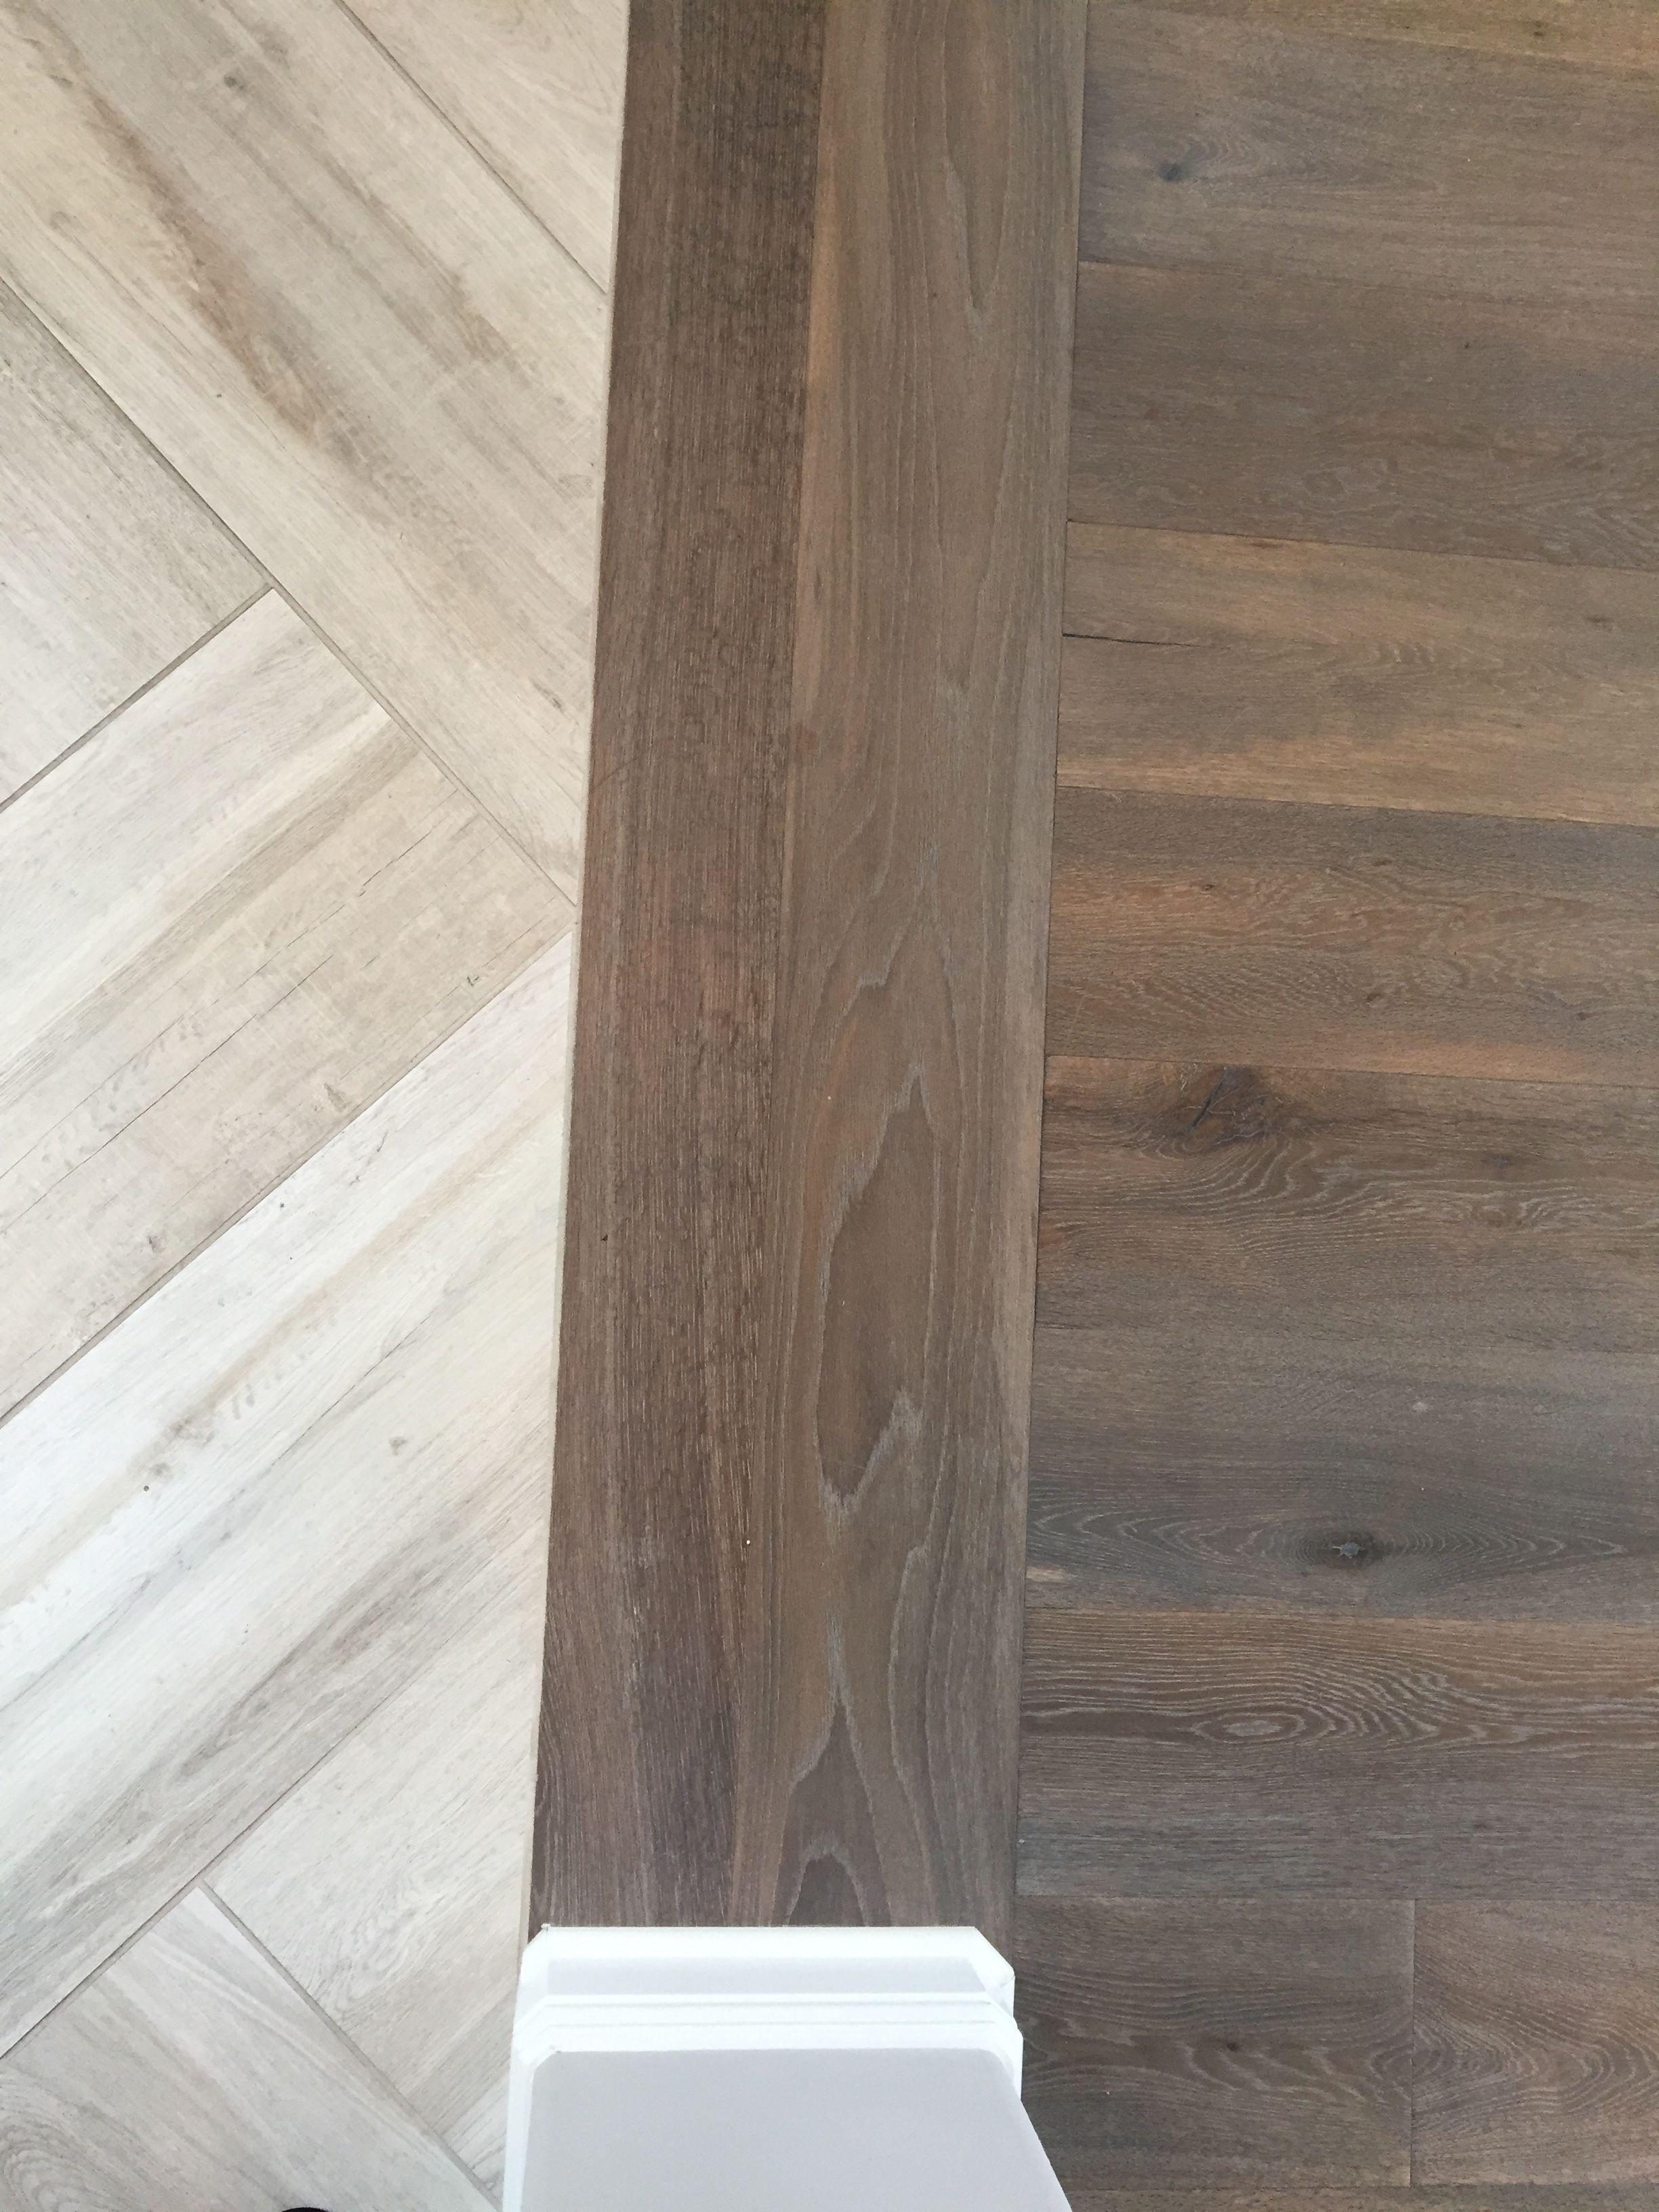 how to install herringbone hardwood floor of transition strip carpet to tile awesome floor transition laminate to pertaining to transition strip carpet to tile awesome floor transition laminate to herringbone tile pattern